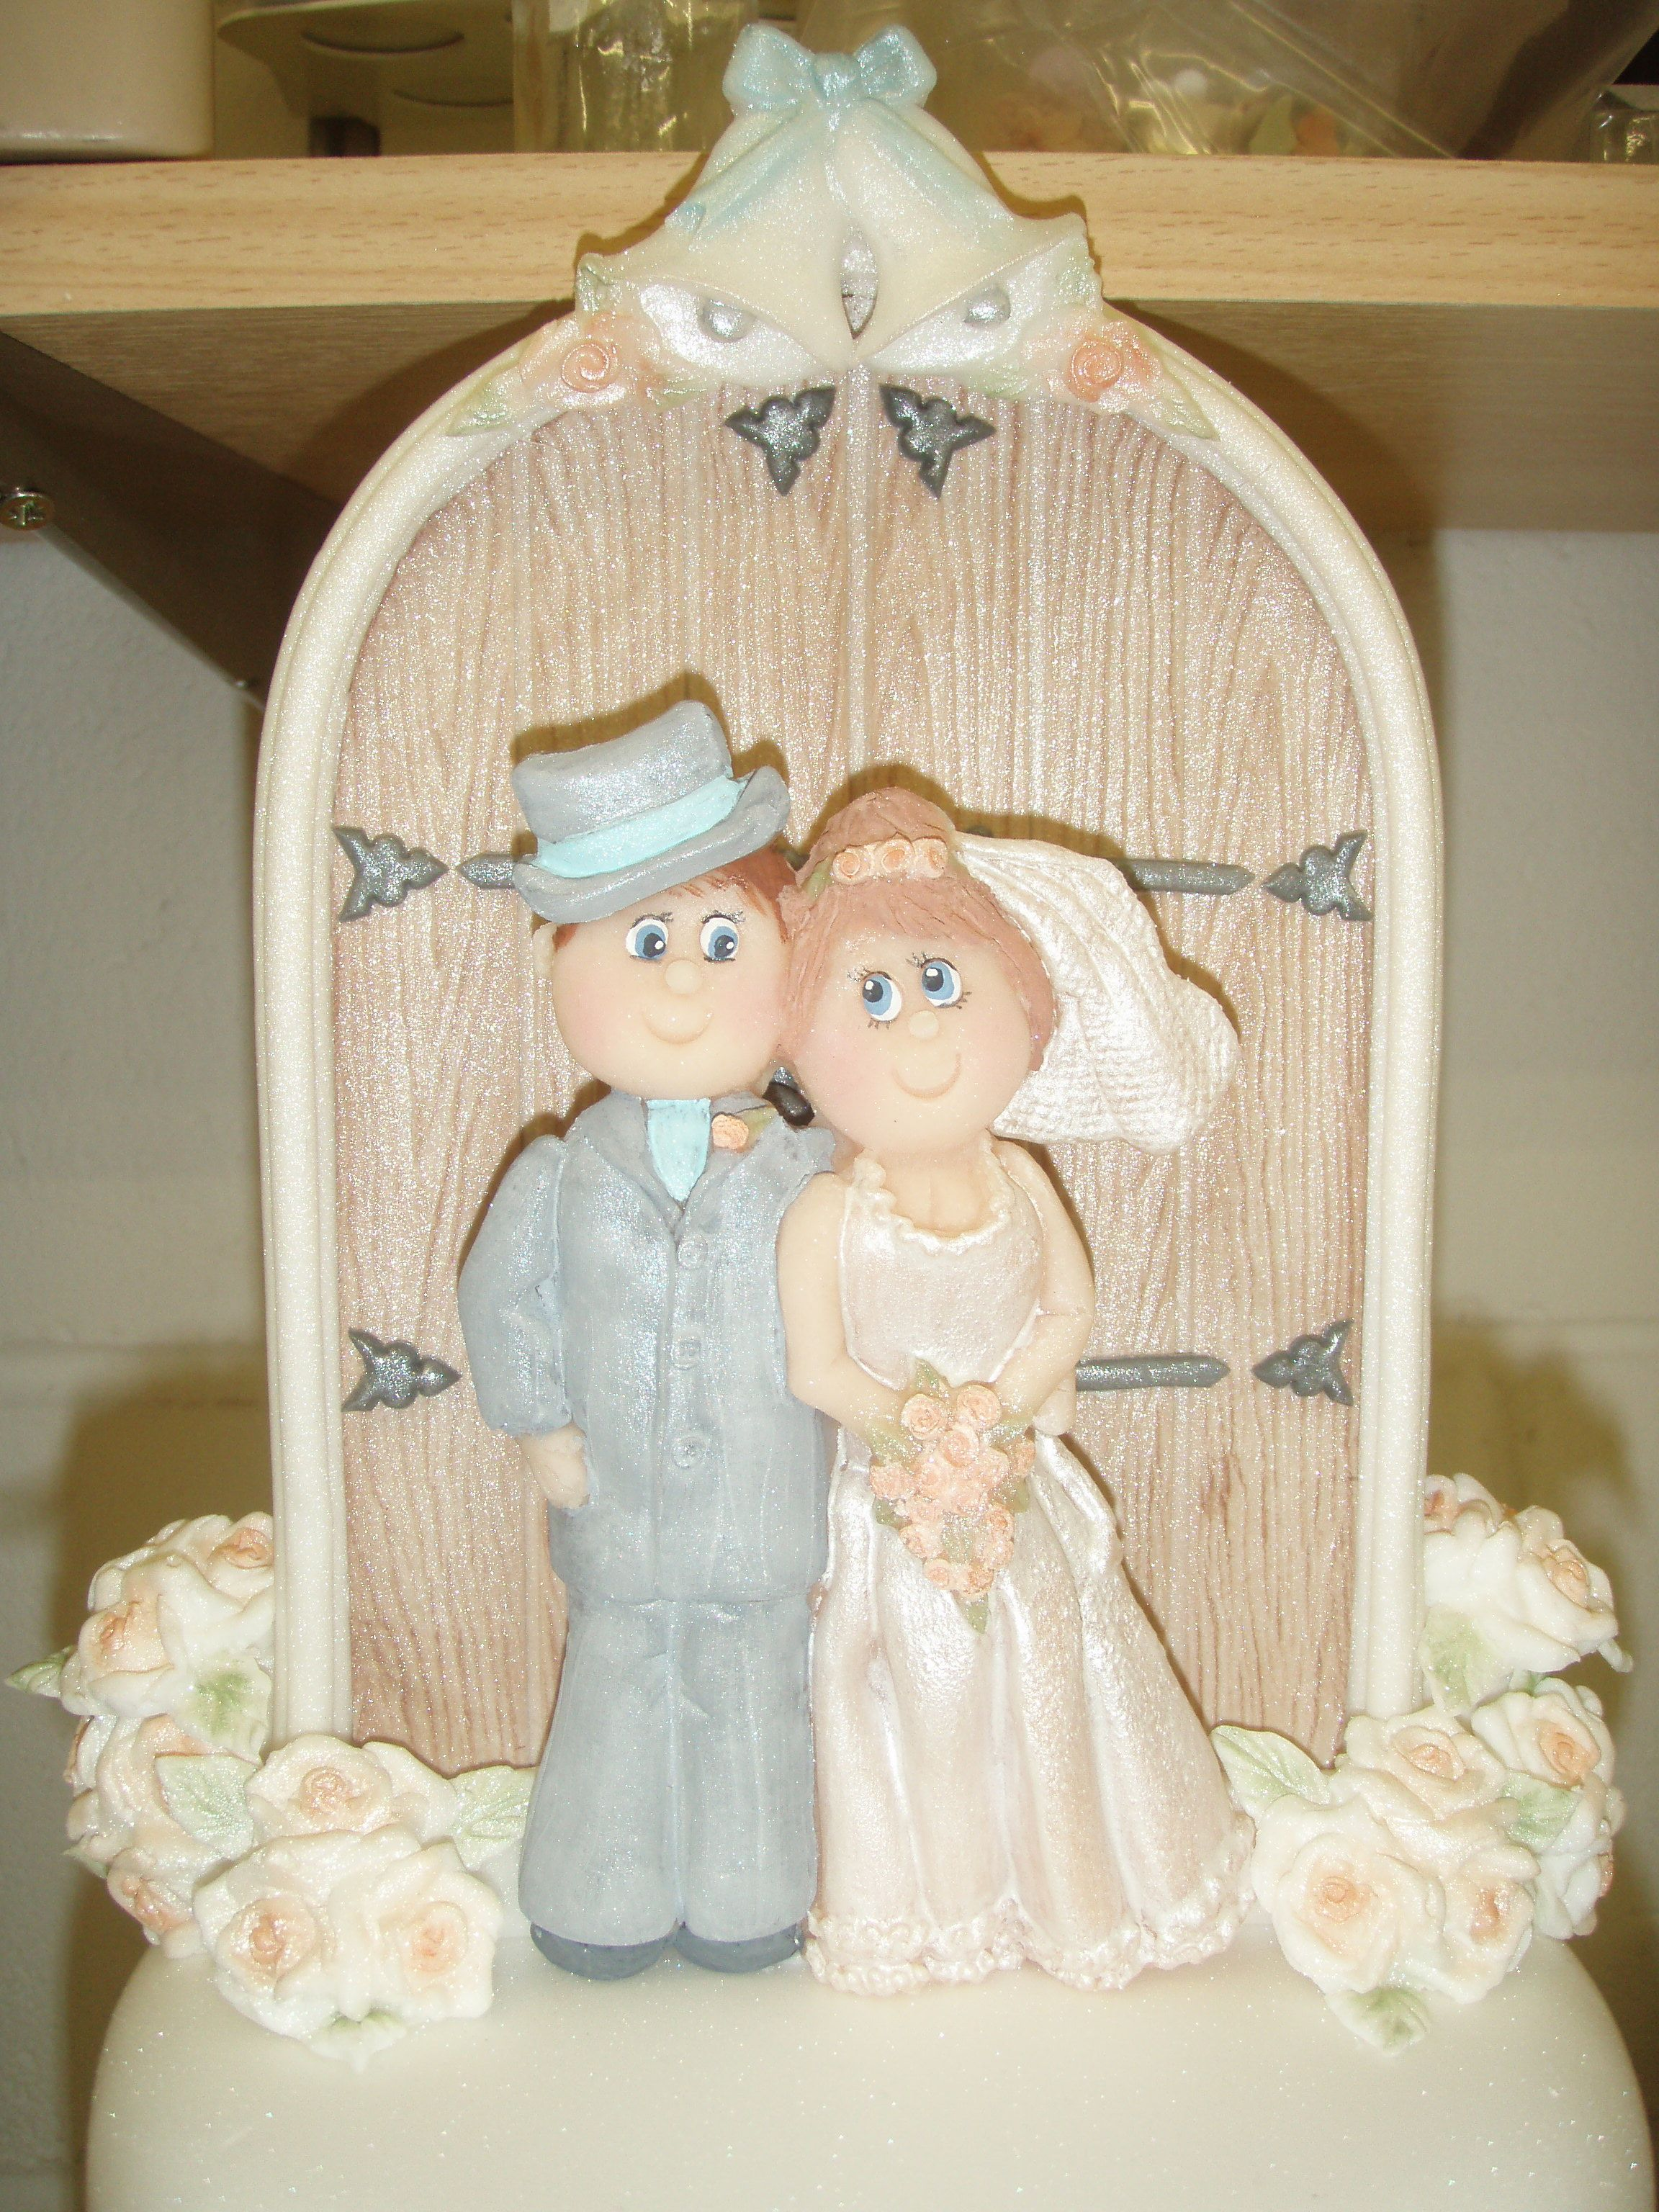 Bride and groom wedding cake topper I made using our Bride & Groom ...